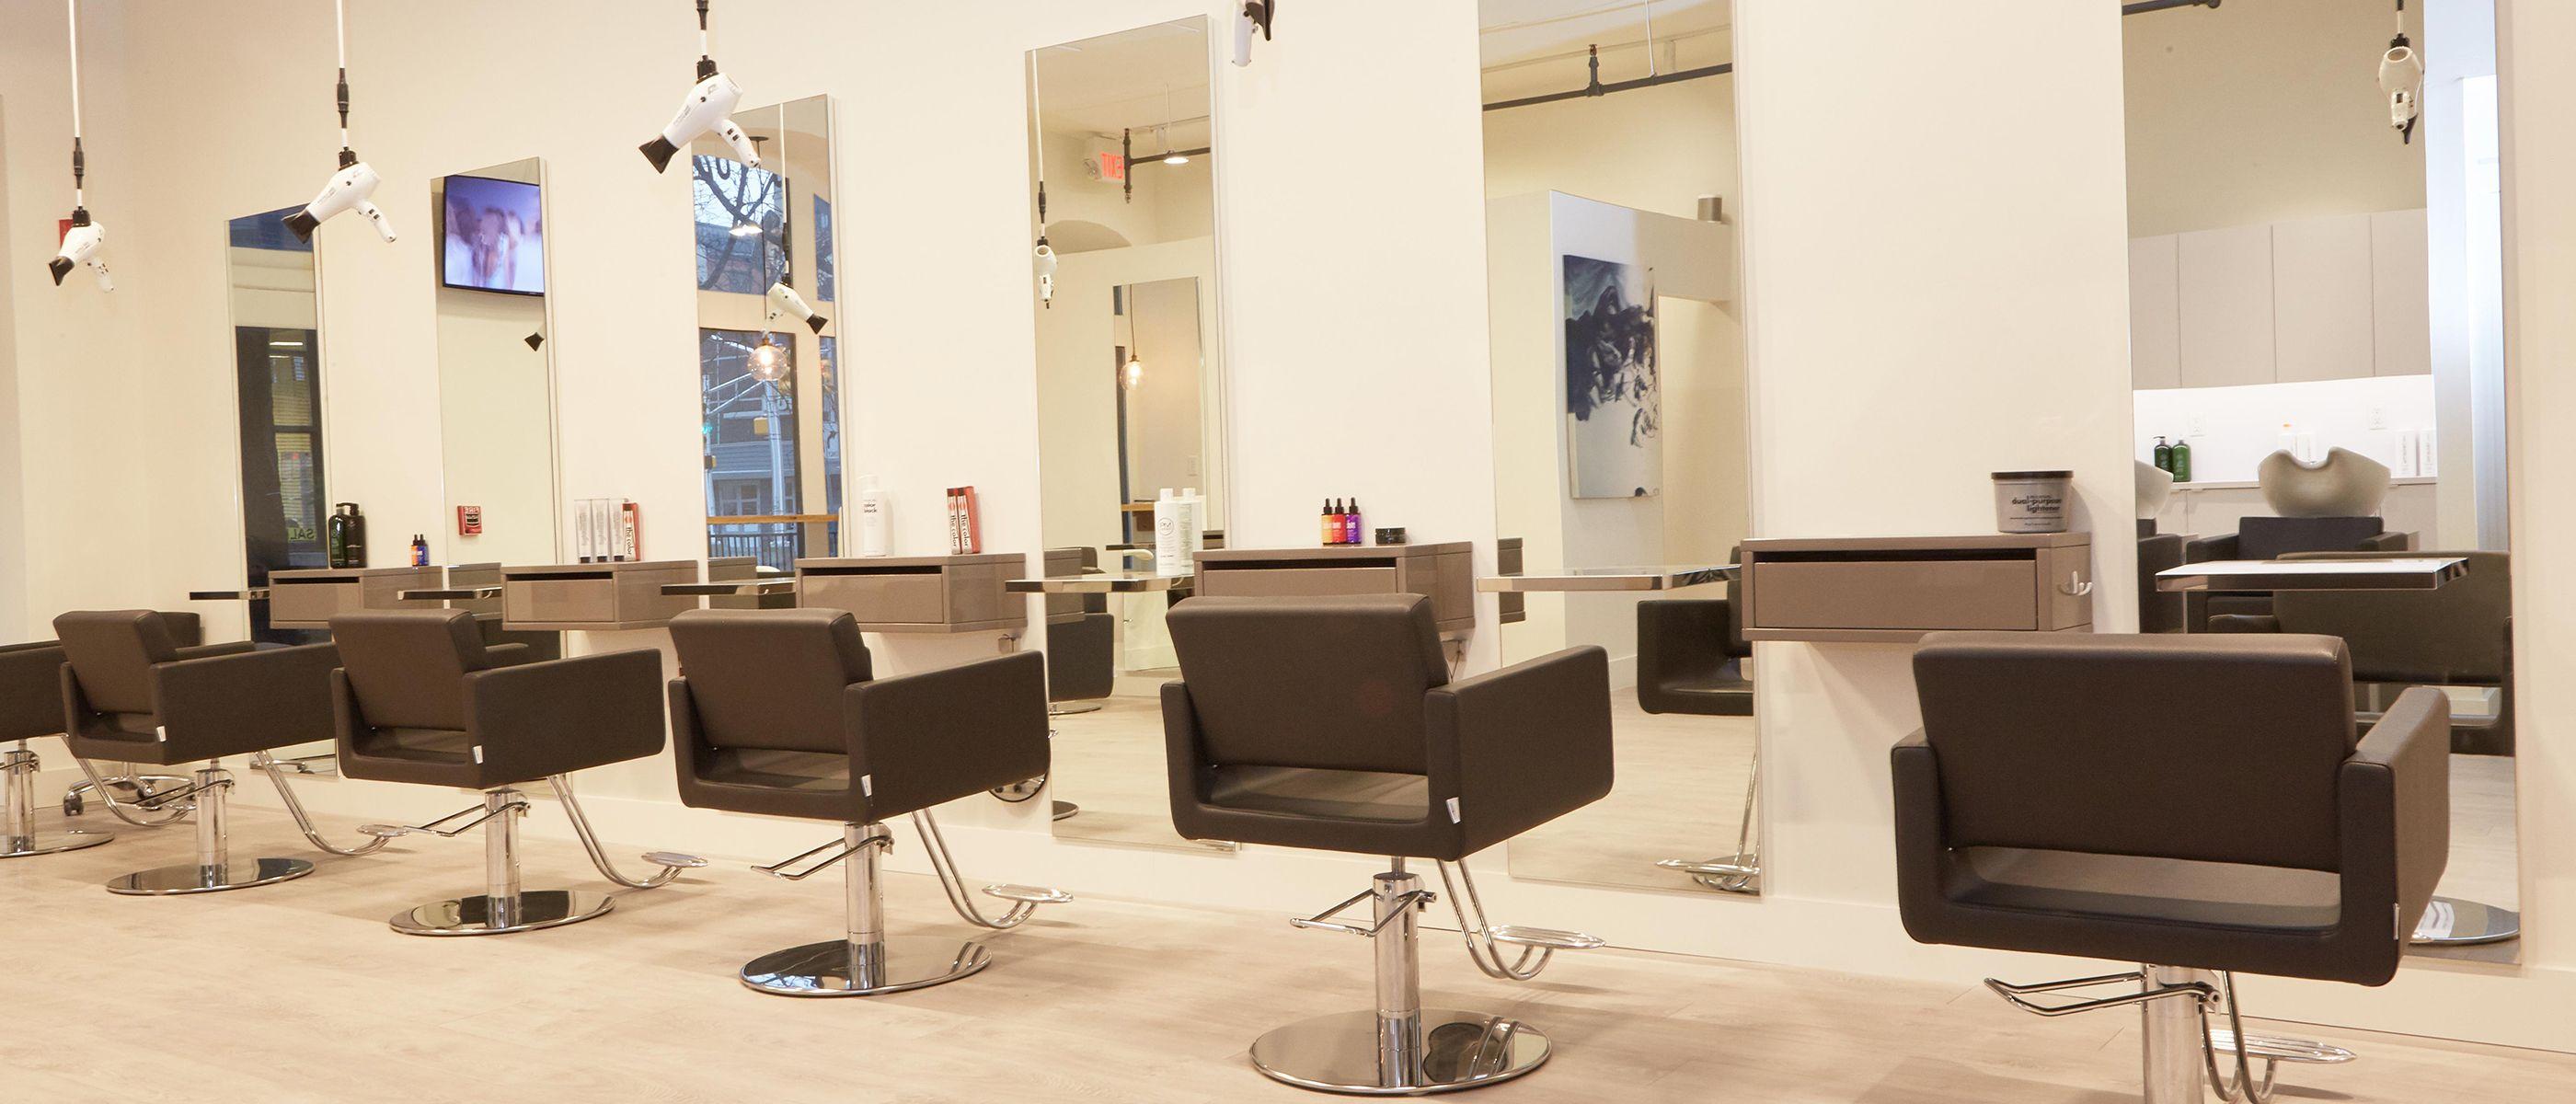 Salon Gatto Hoboken Hair Stylist And Salon By Christine Gatto Hair Salon Top Salons Hairdresser Salon